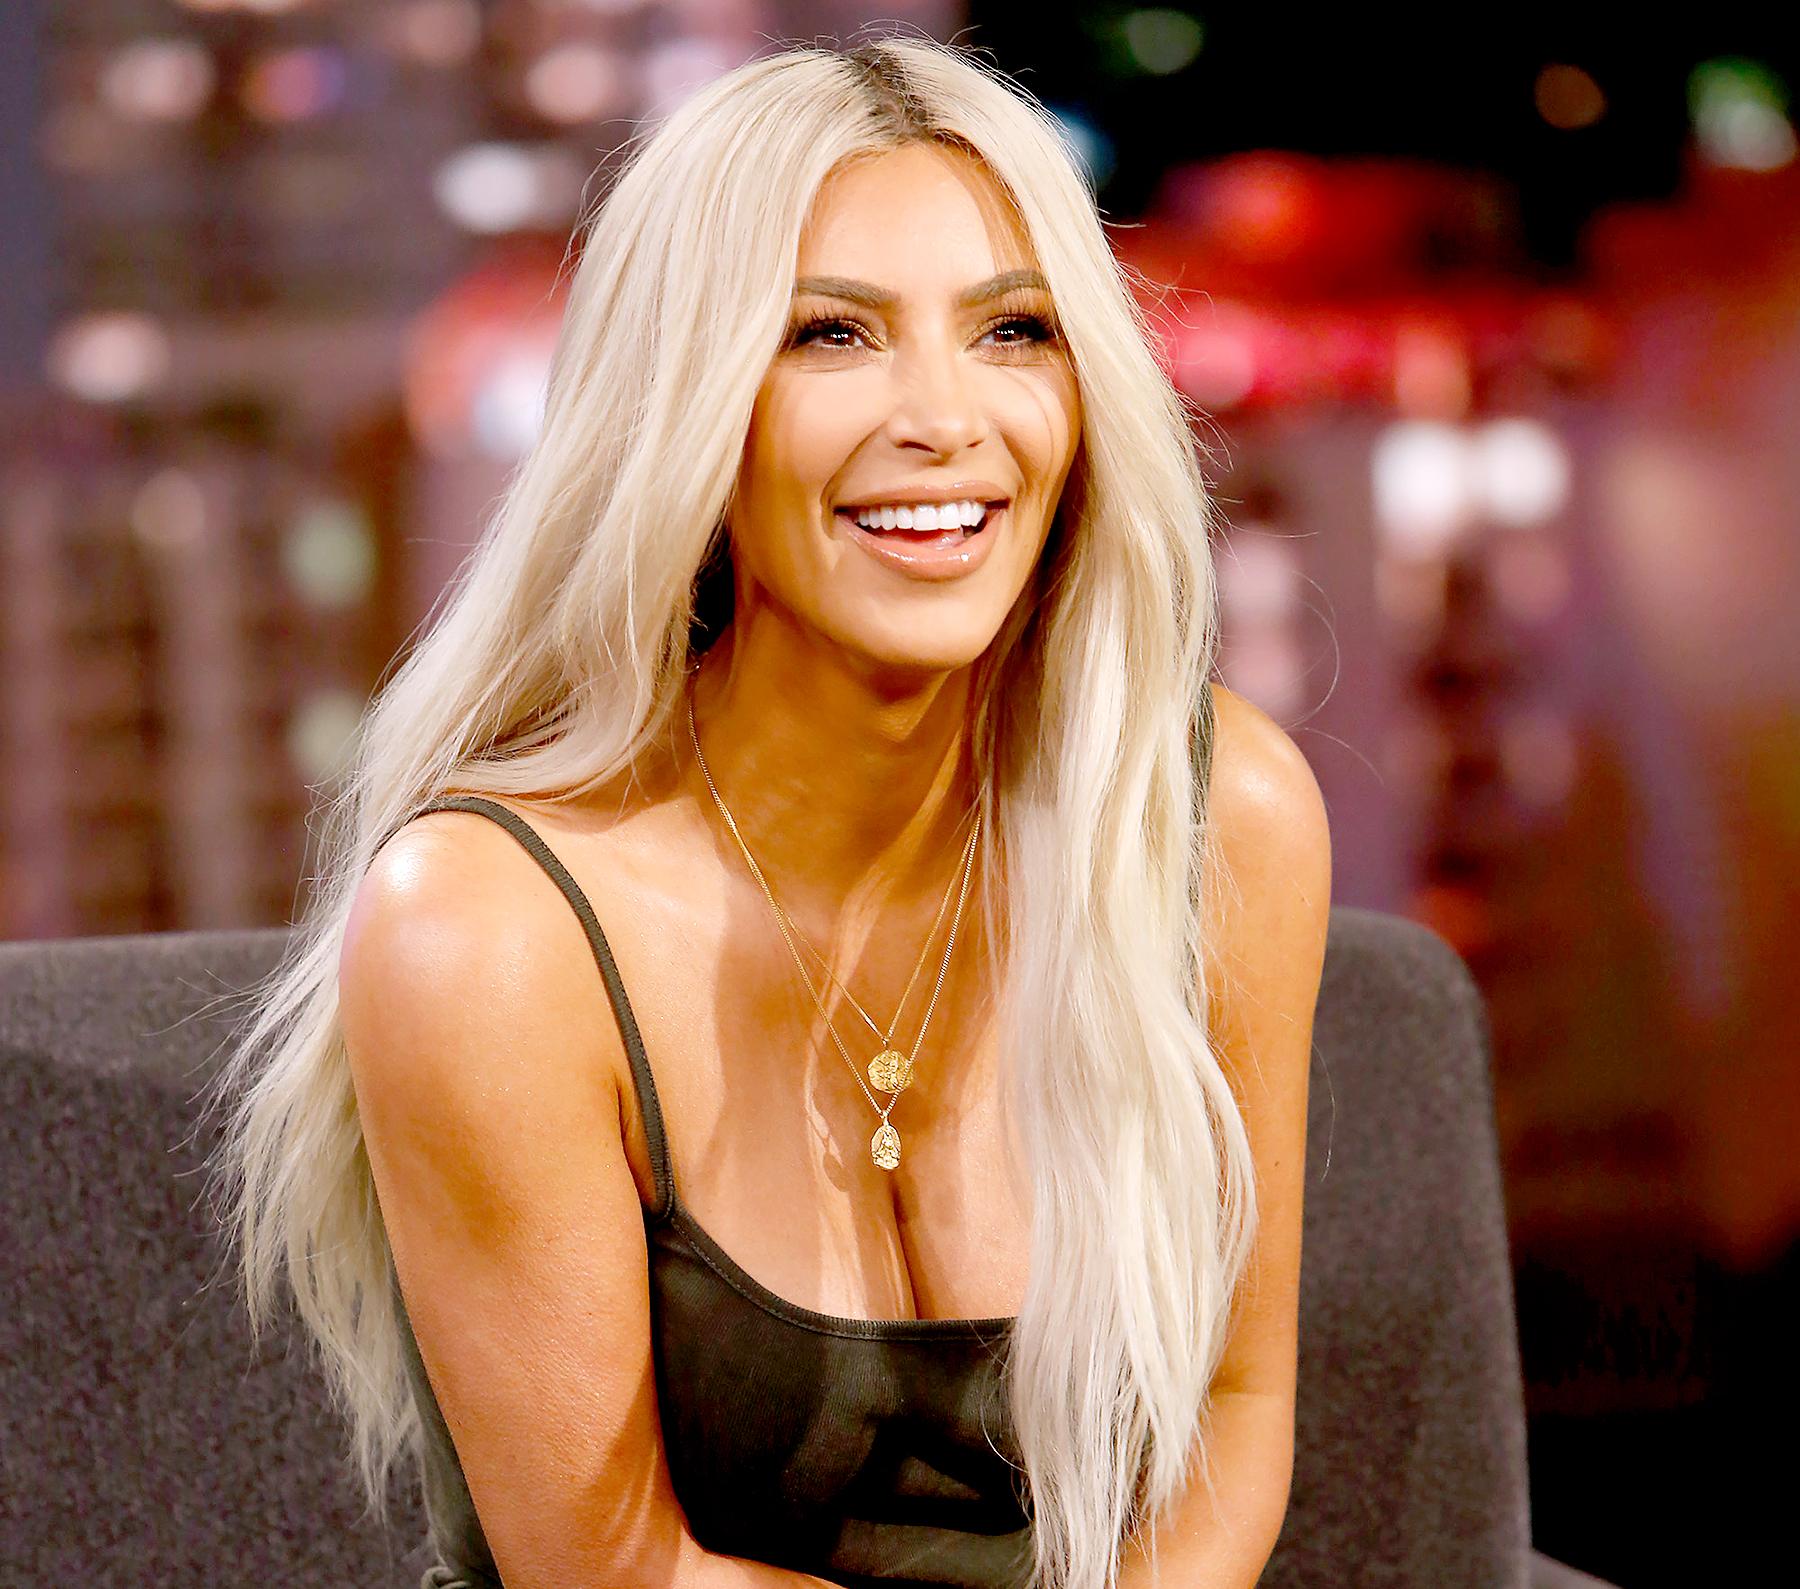 This 10 Serum Is the Reason Kim Kardashian Doesnt Have a Single Wrinkle This 10 Serum Is the Reason Kim Kardashian Doesnt Have a Single Wrinkle new pics